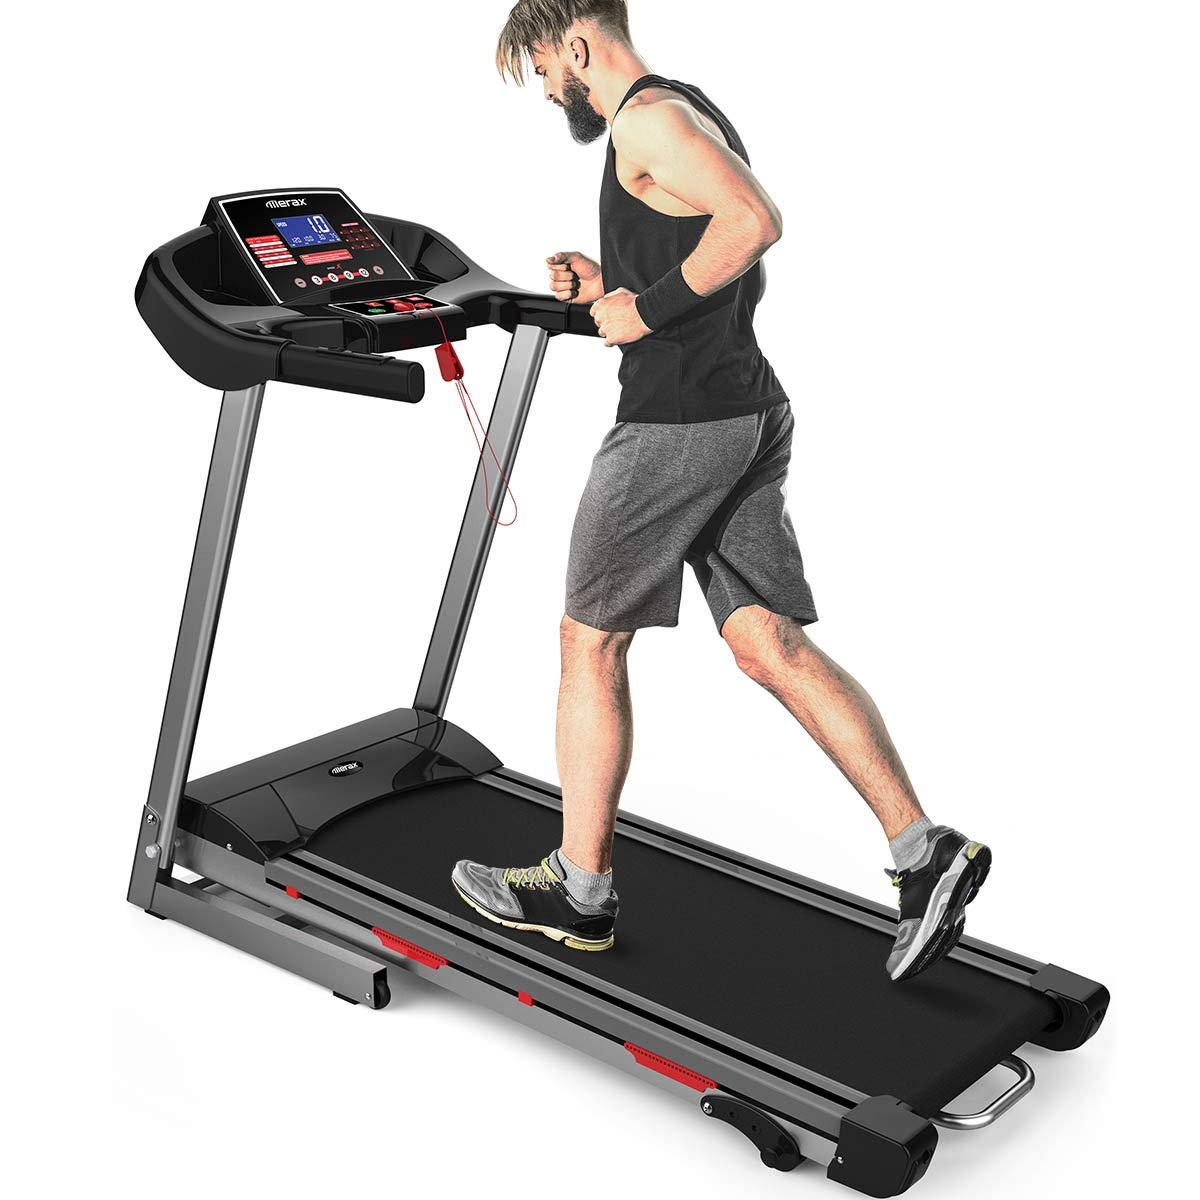 Merax Electric Folding Treadmill Running Jogging Machine, 16.5'' Wide Running Surface, Convenient Shortcut Buttons, Shock-Absorbing Running Board